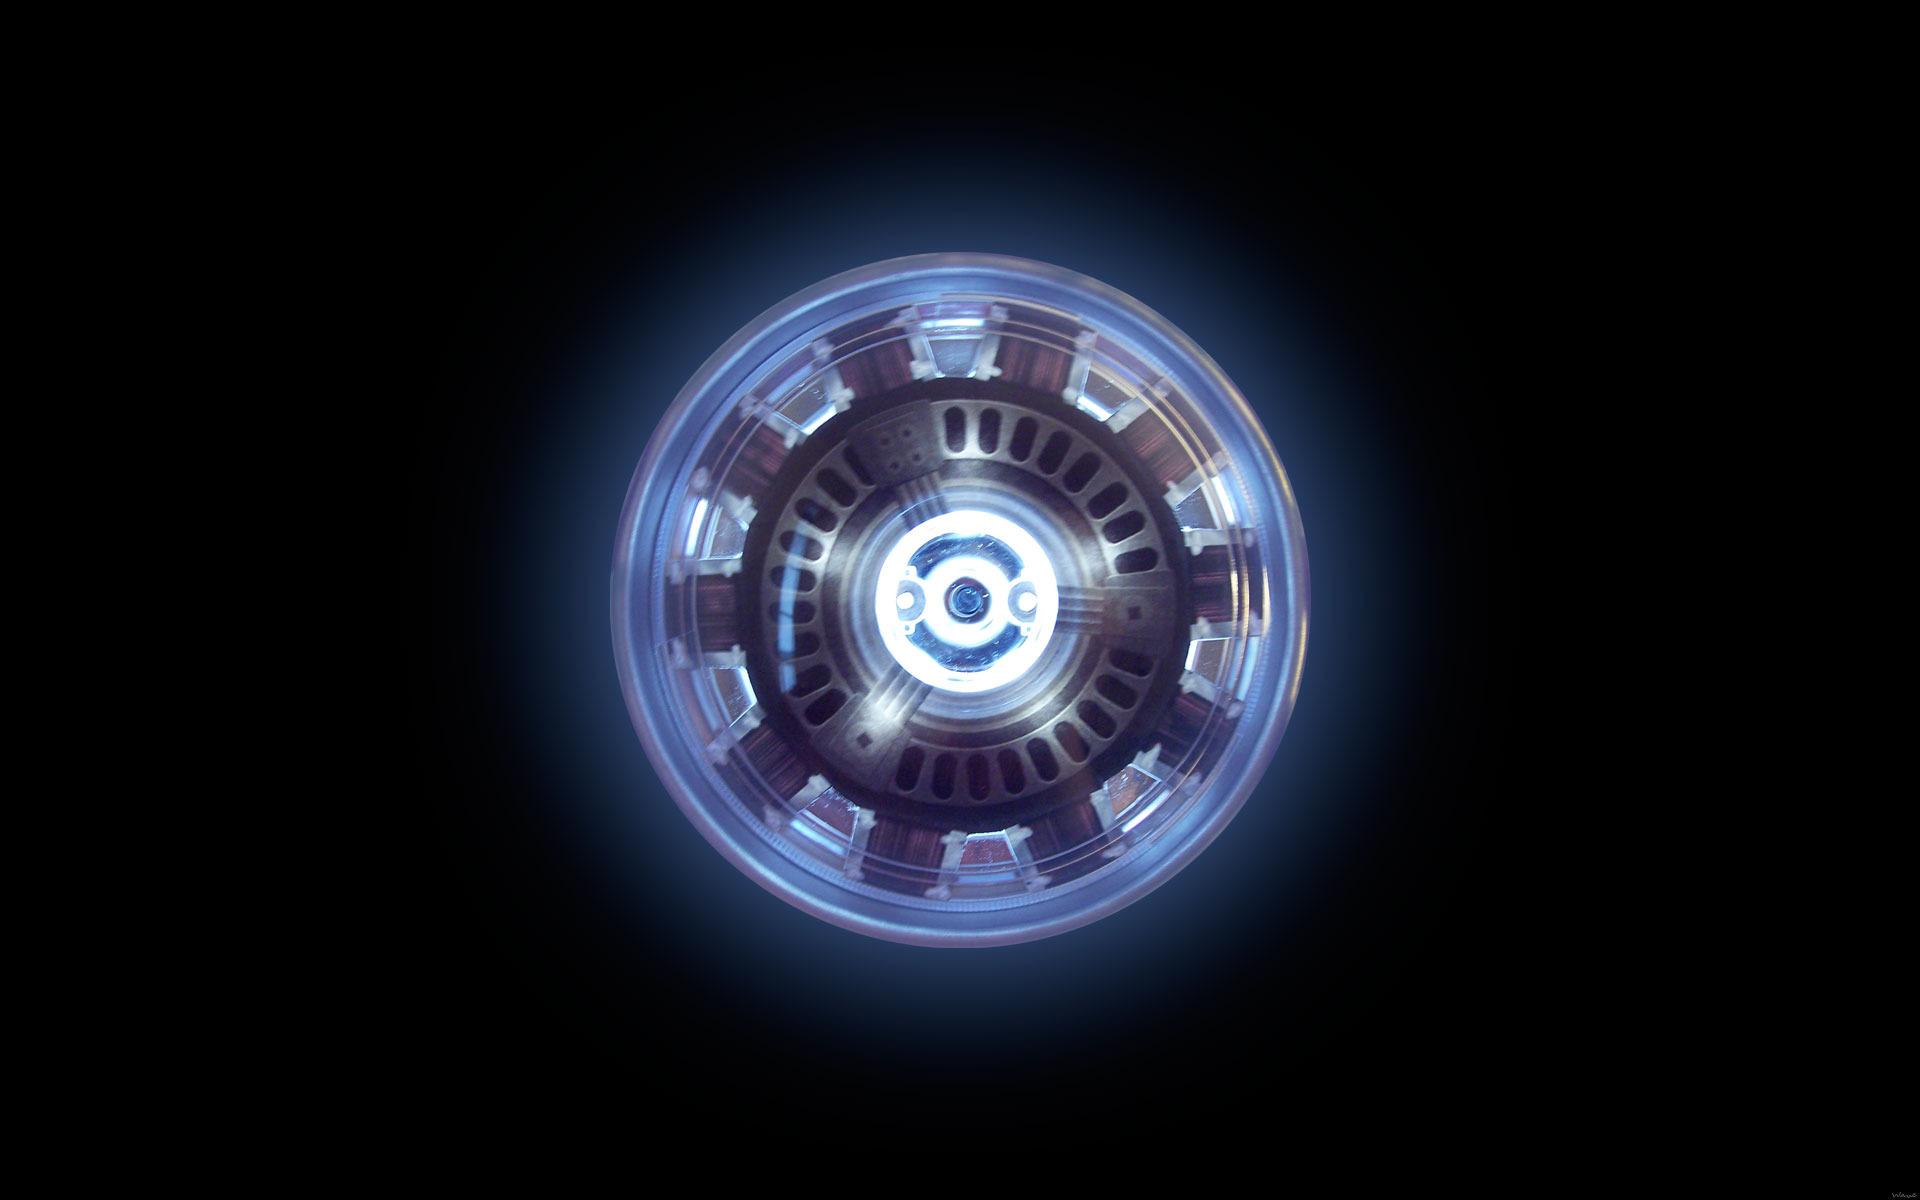 Iron Man Wallpaper 127 Arc Reactor Images Wallpaper